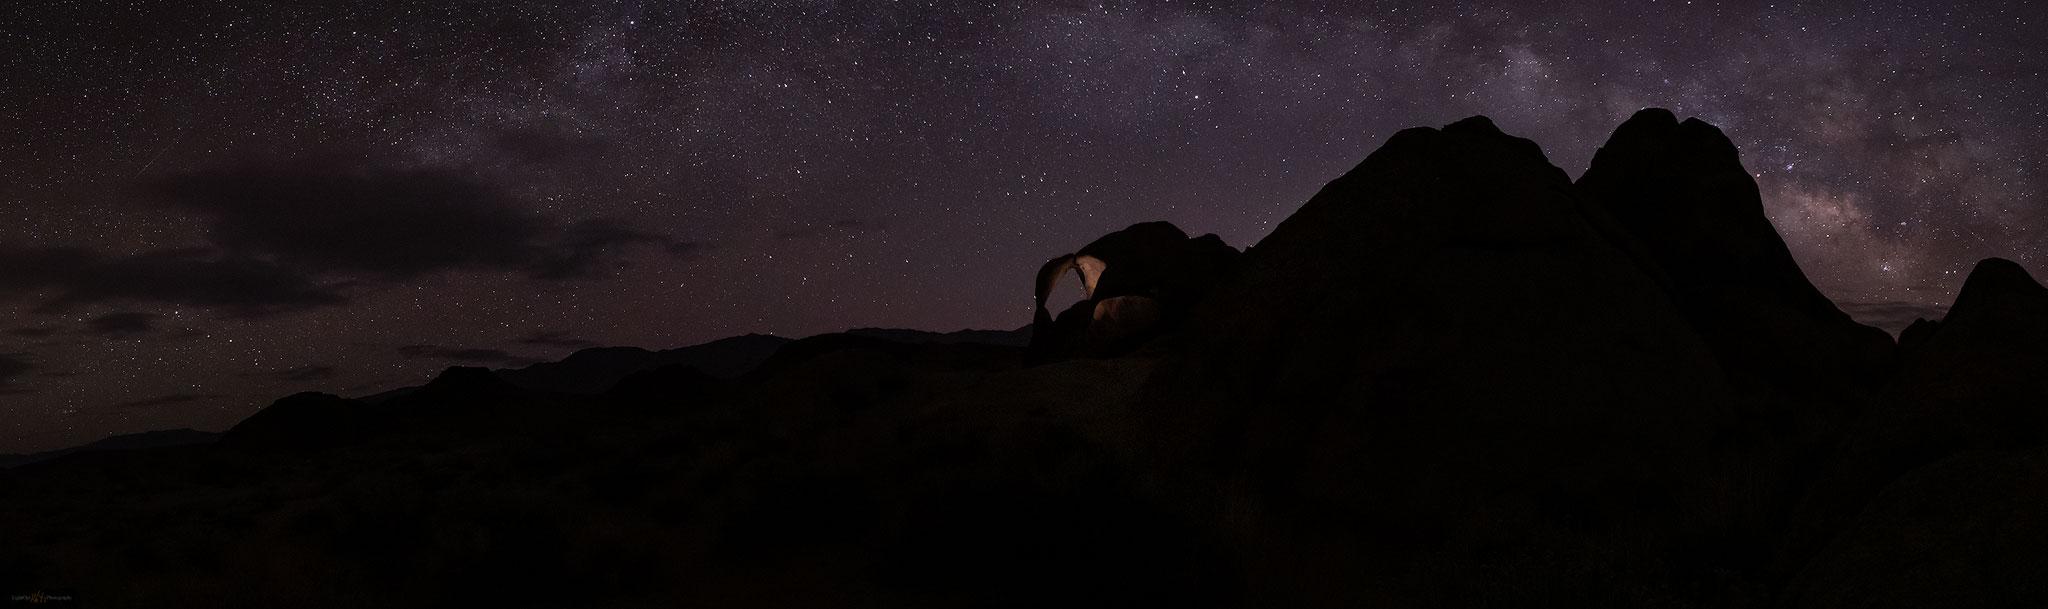 astrophotography at Cyclops Arch, Alabama Hills, California